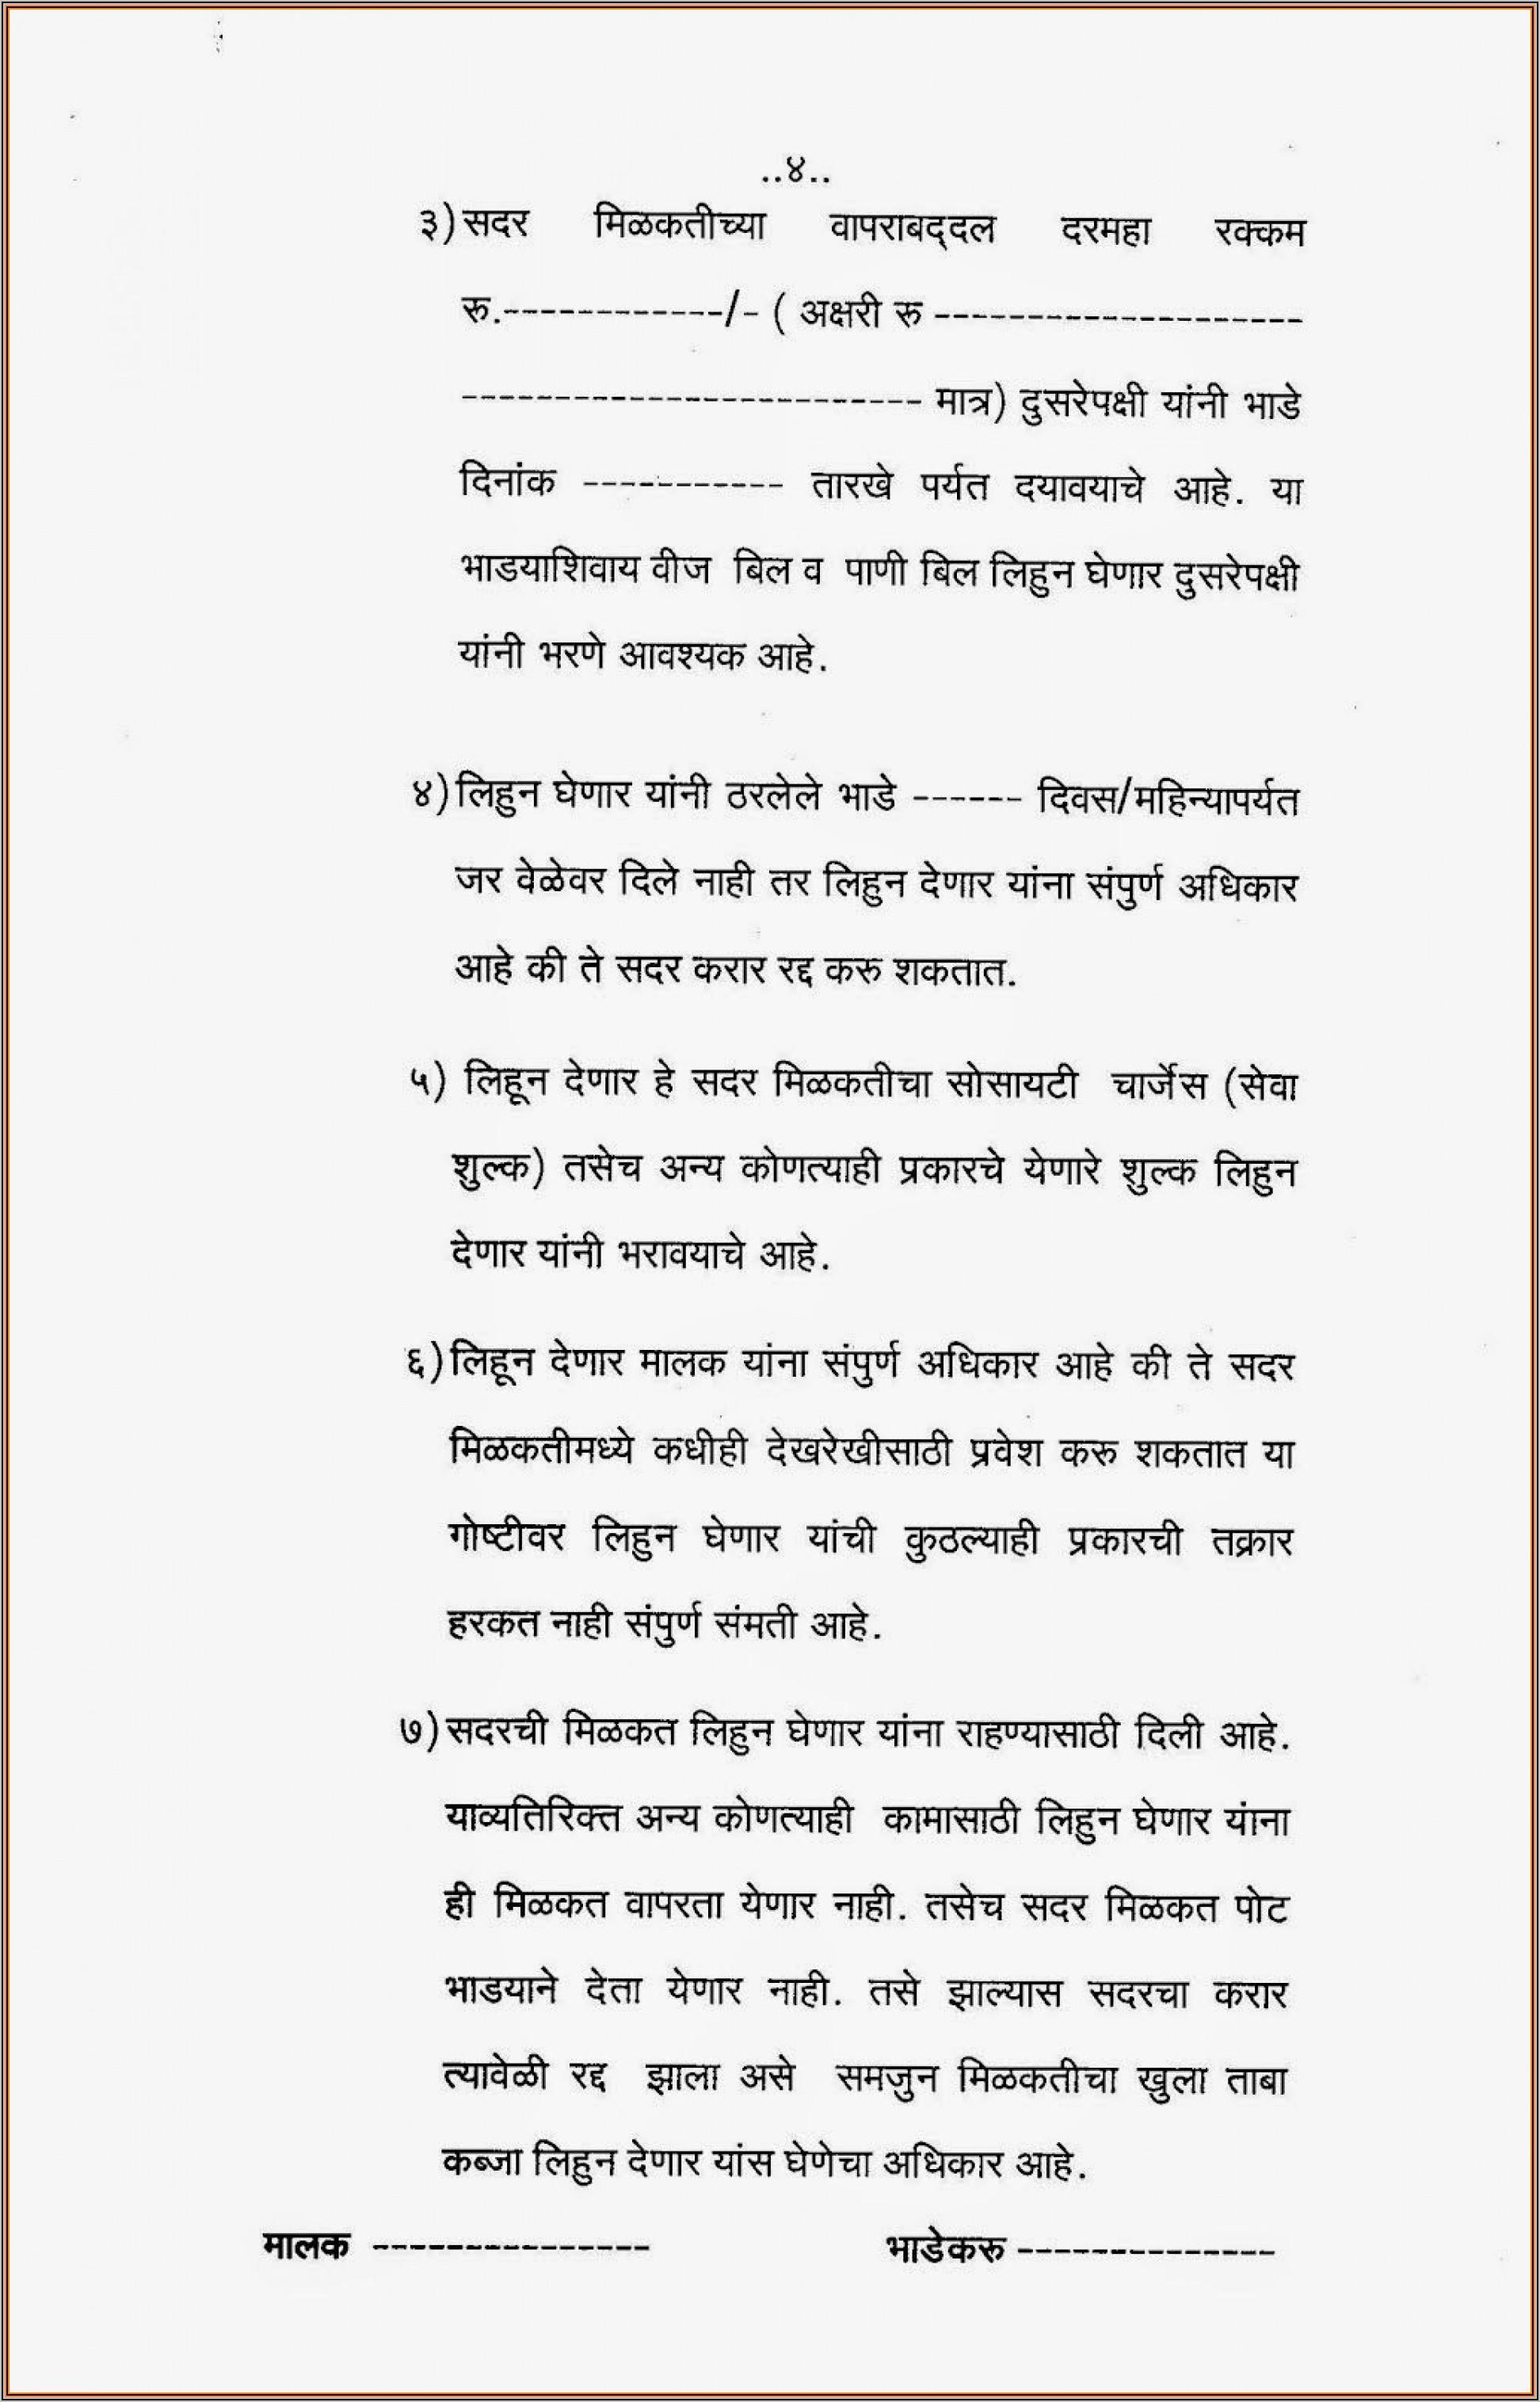 Mortgage Deed Format In Hindi